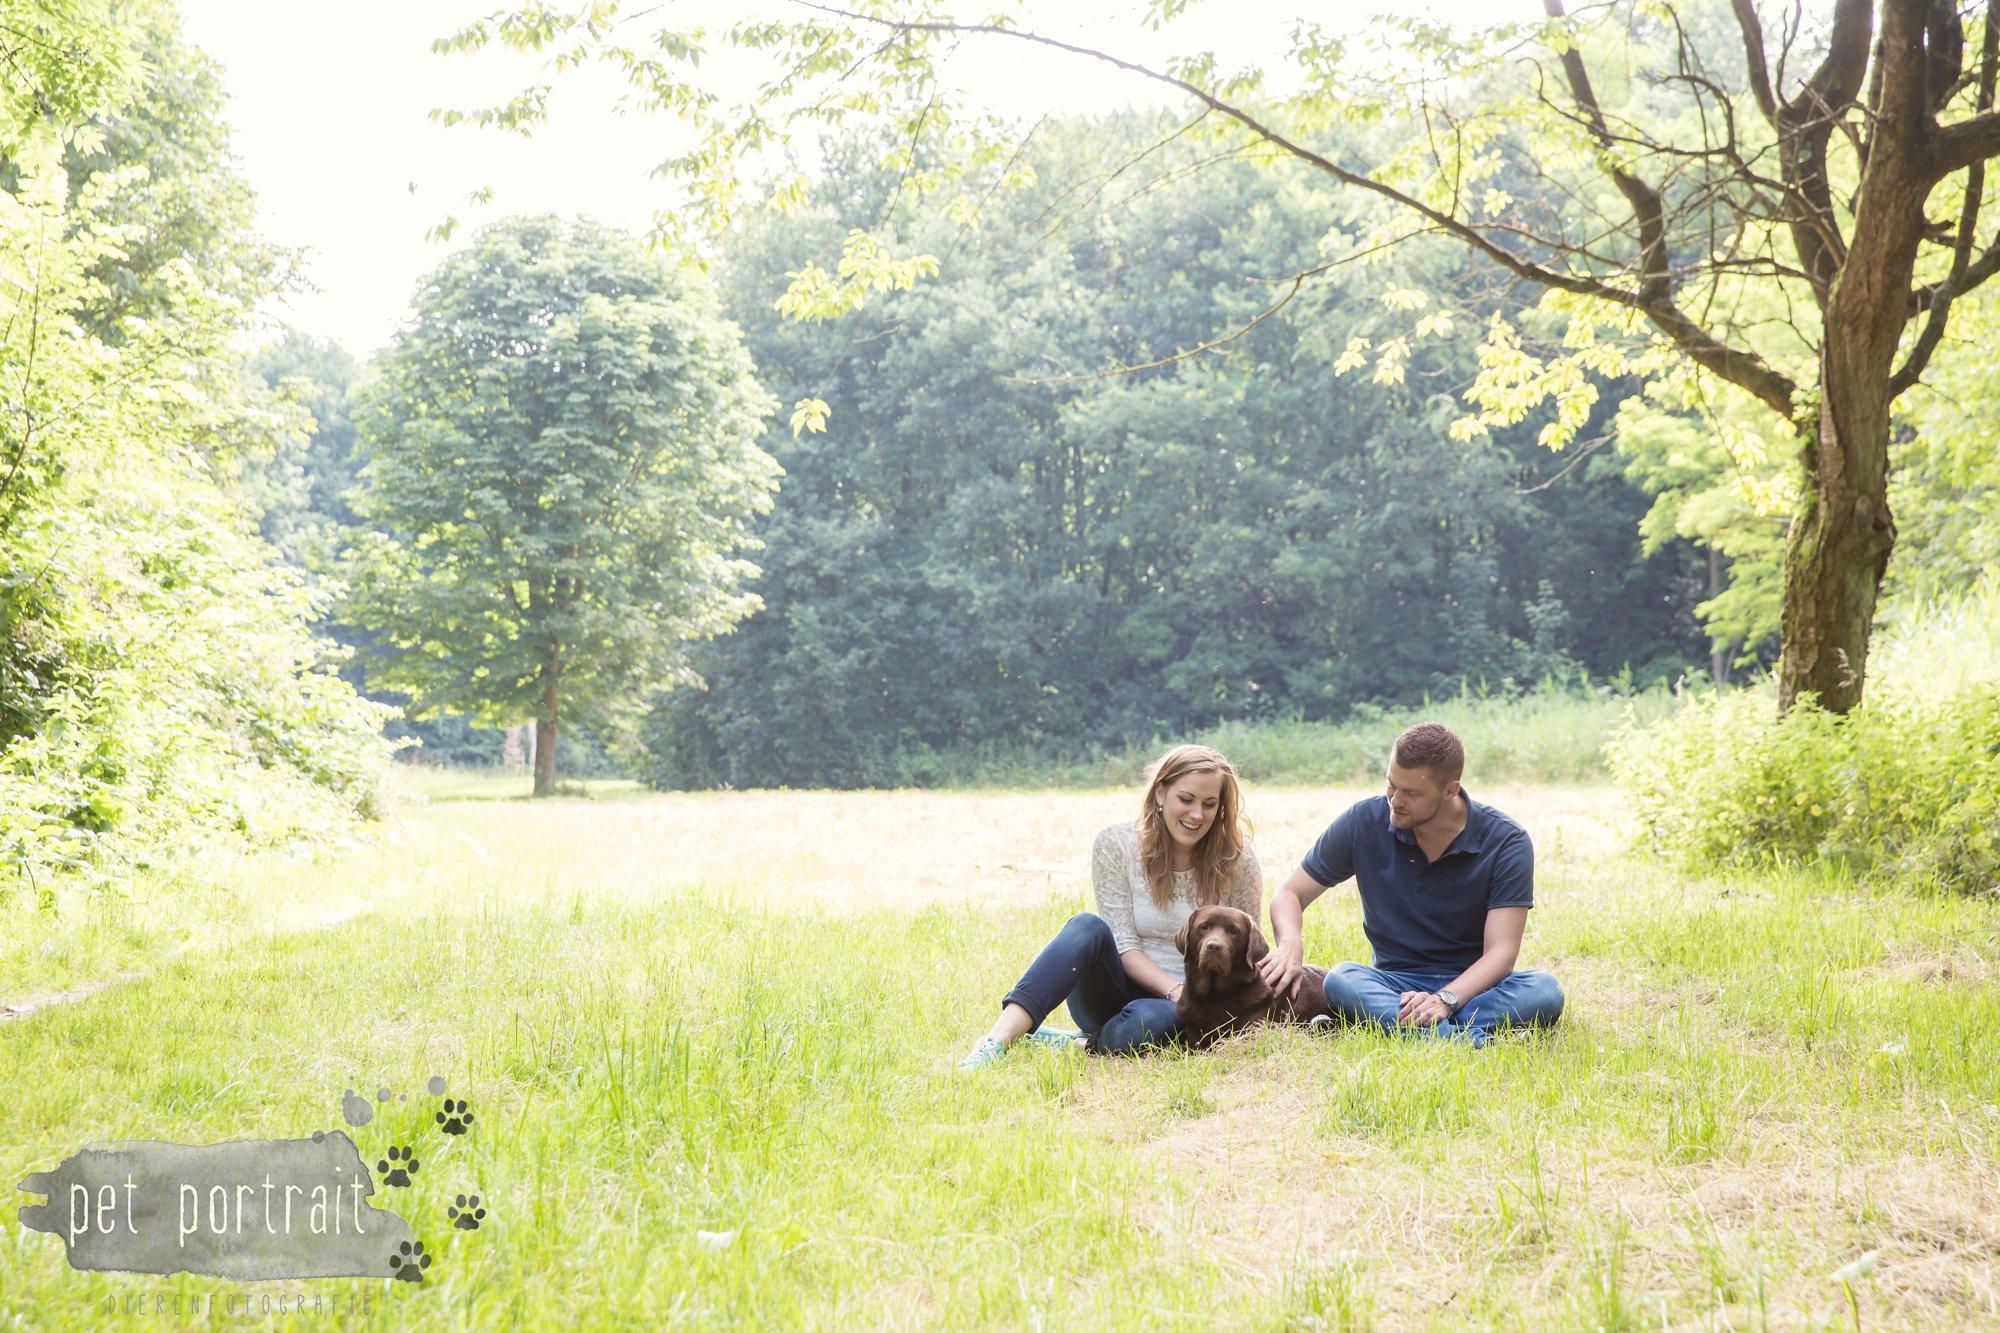 Hondenfotograaf Lelystad - Beloved Dier en Baasje fotoshoot-3